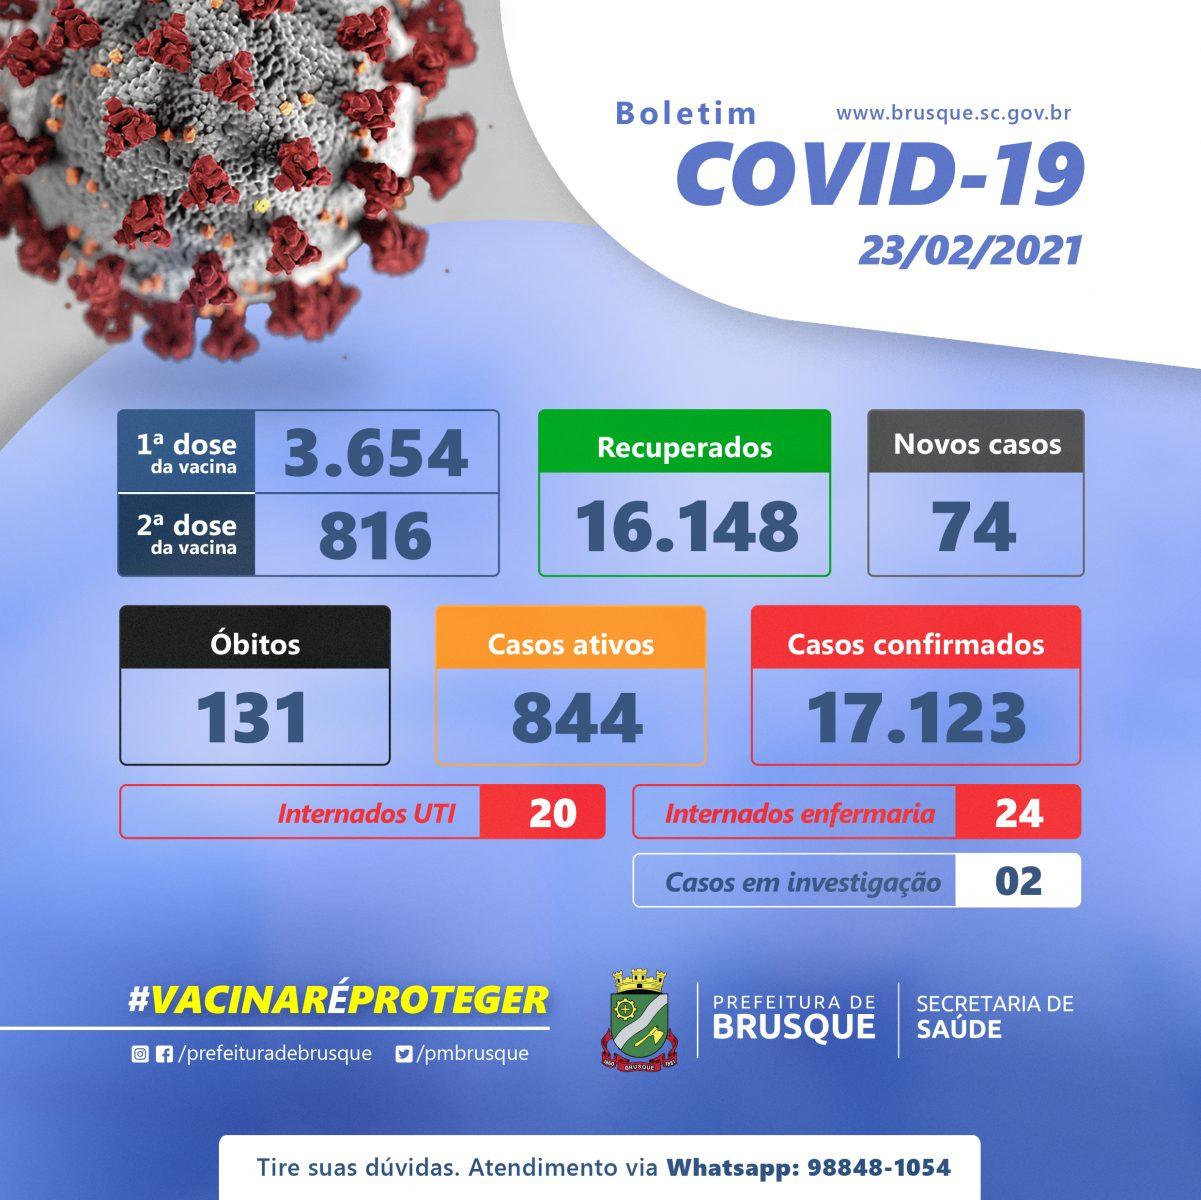 Covid-19: Confira o boletim epidemiológico desta terça-feira (23)